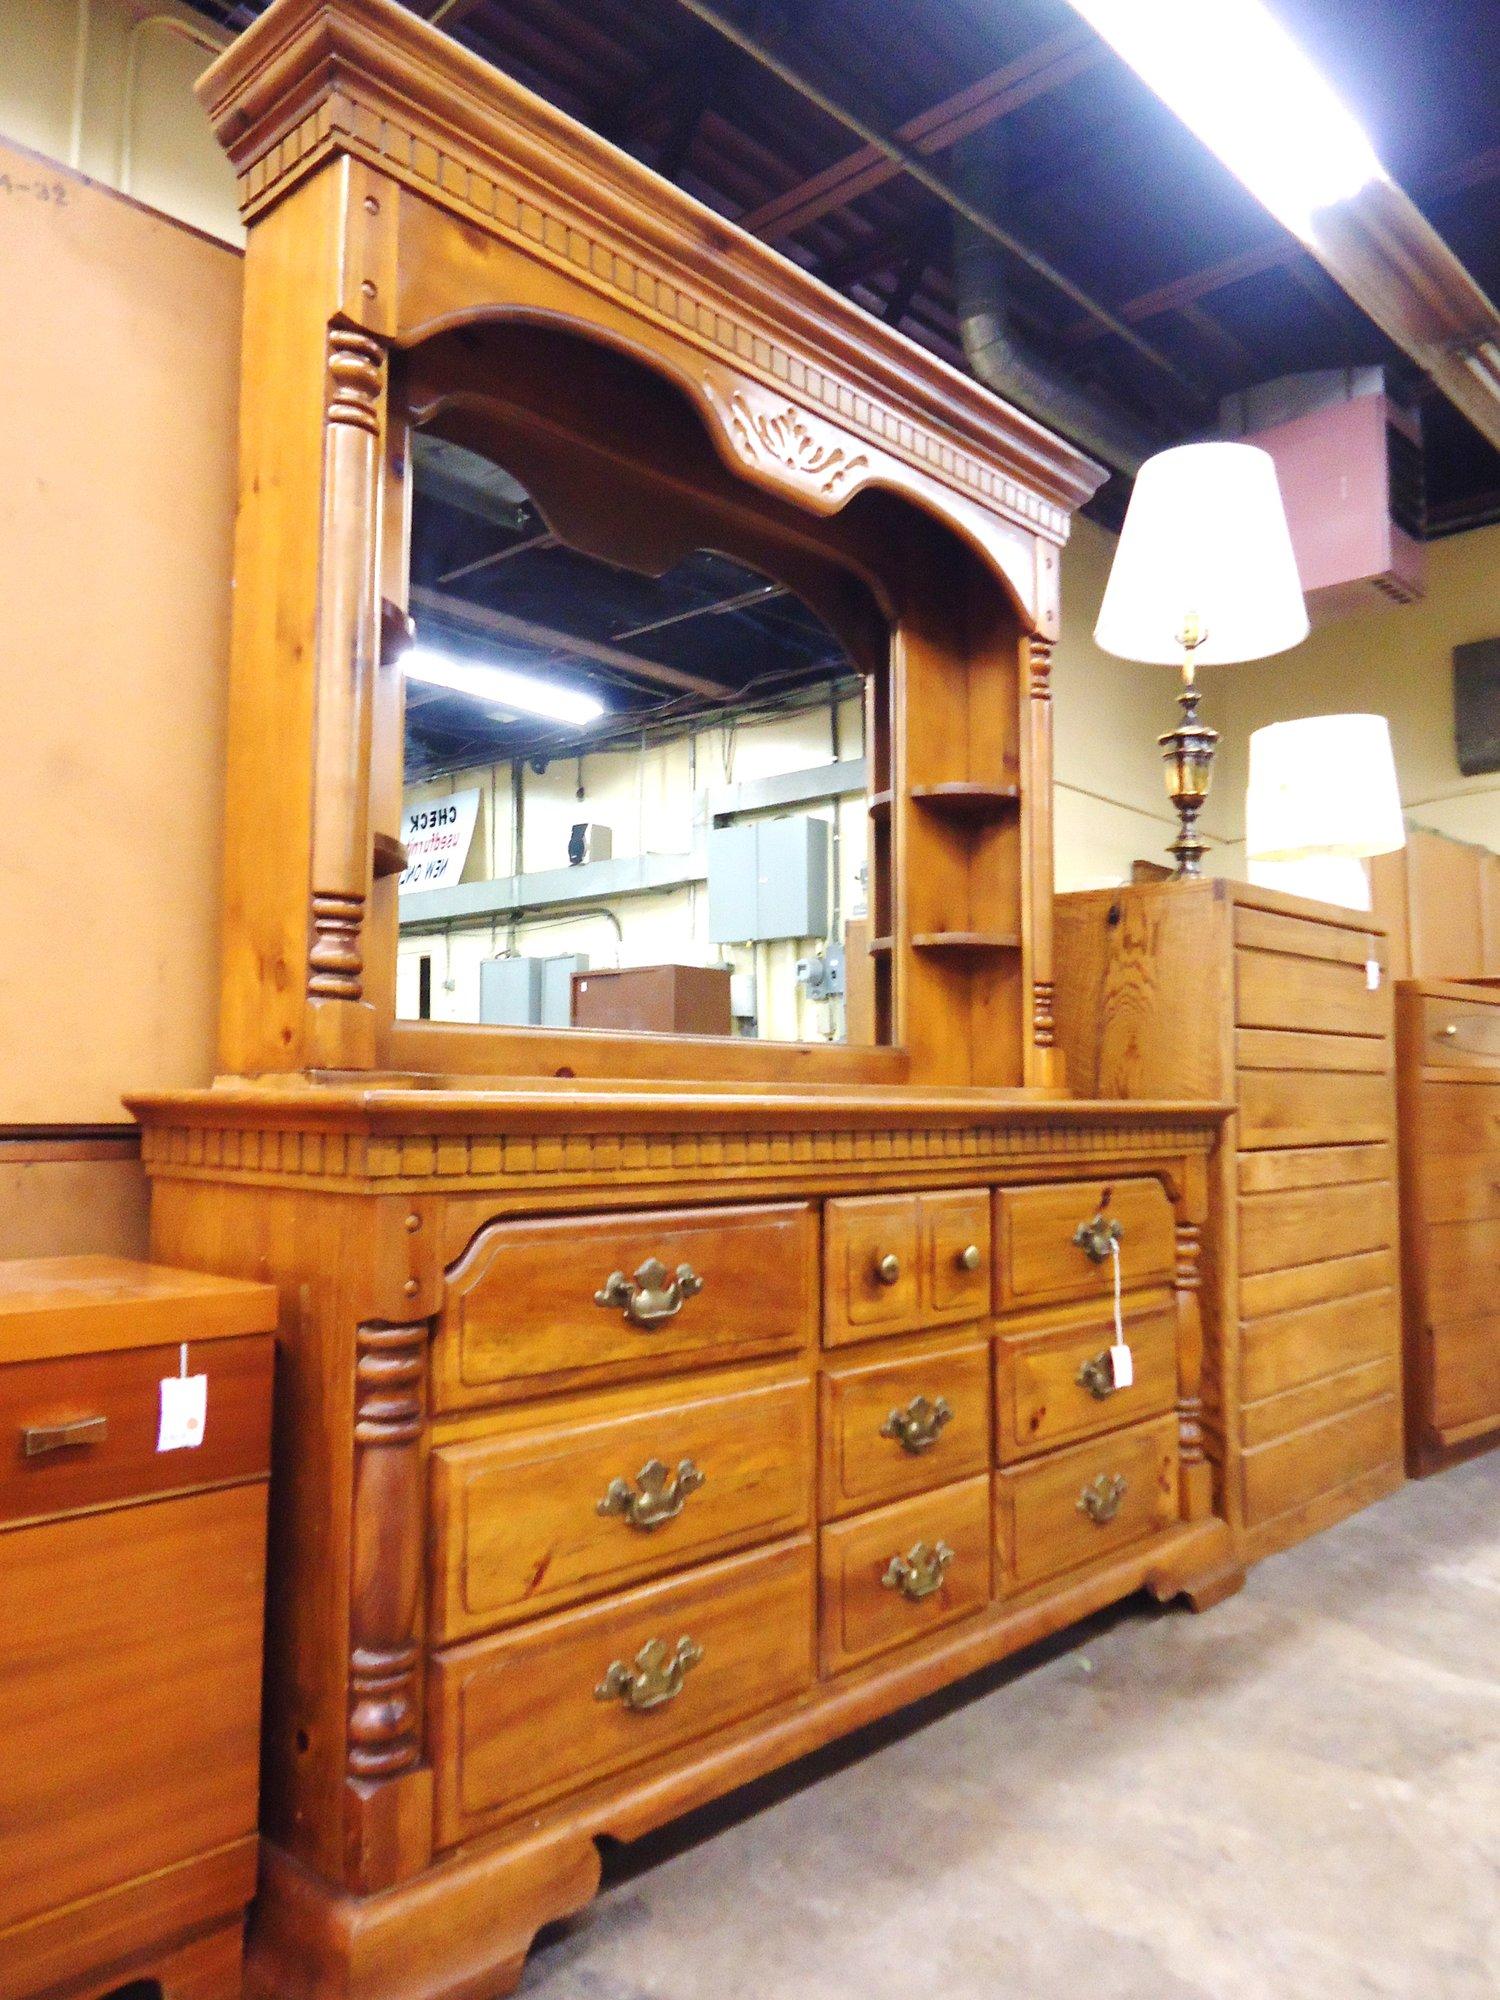 1 14036 Basset Pine Dresser With Hutch Amp Mirror Is Sold